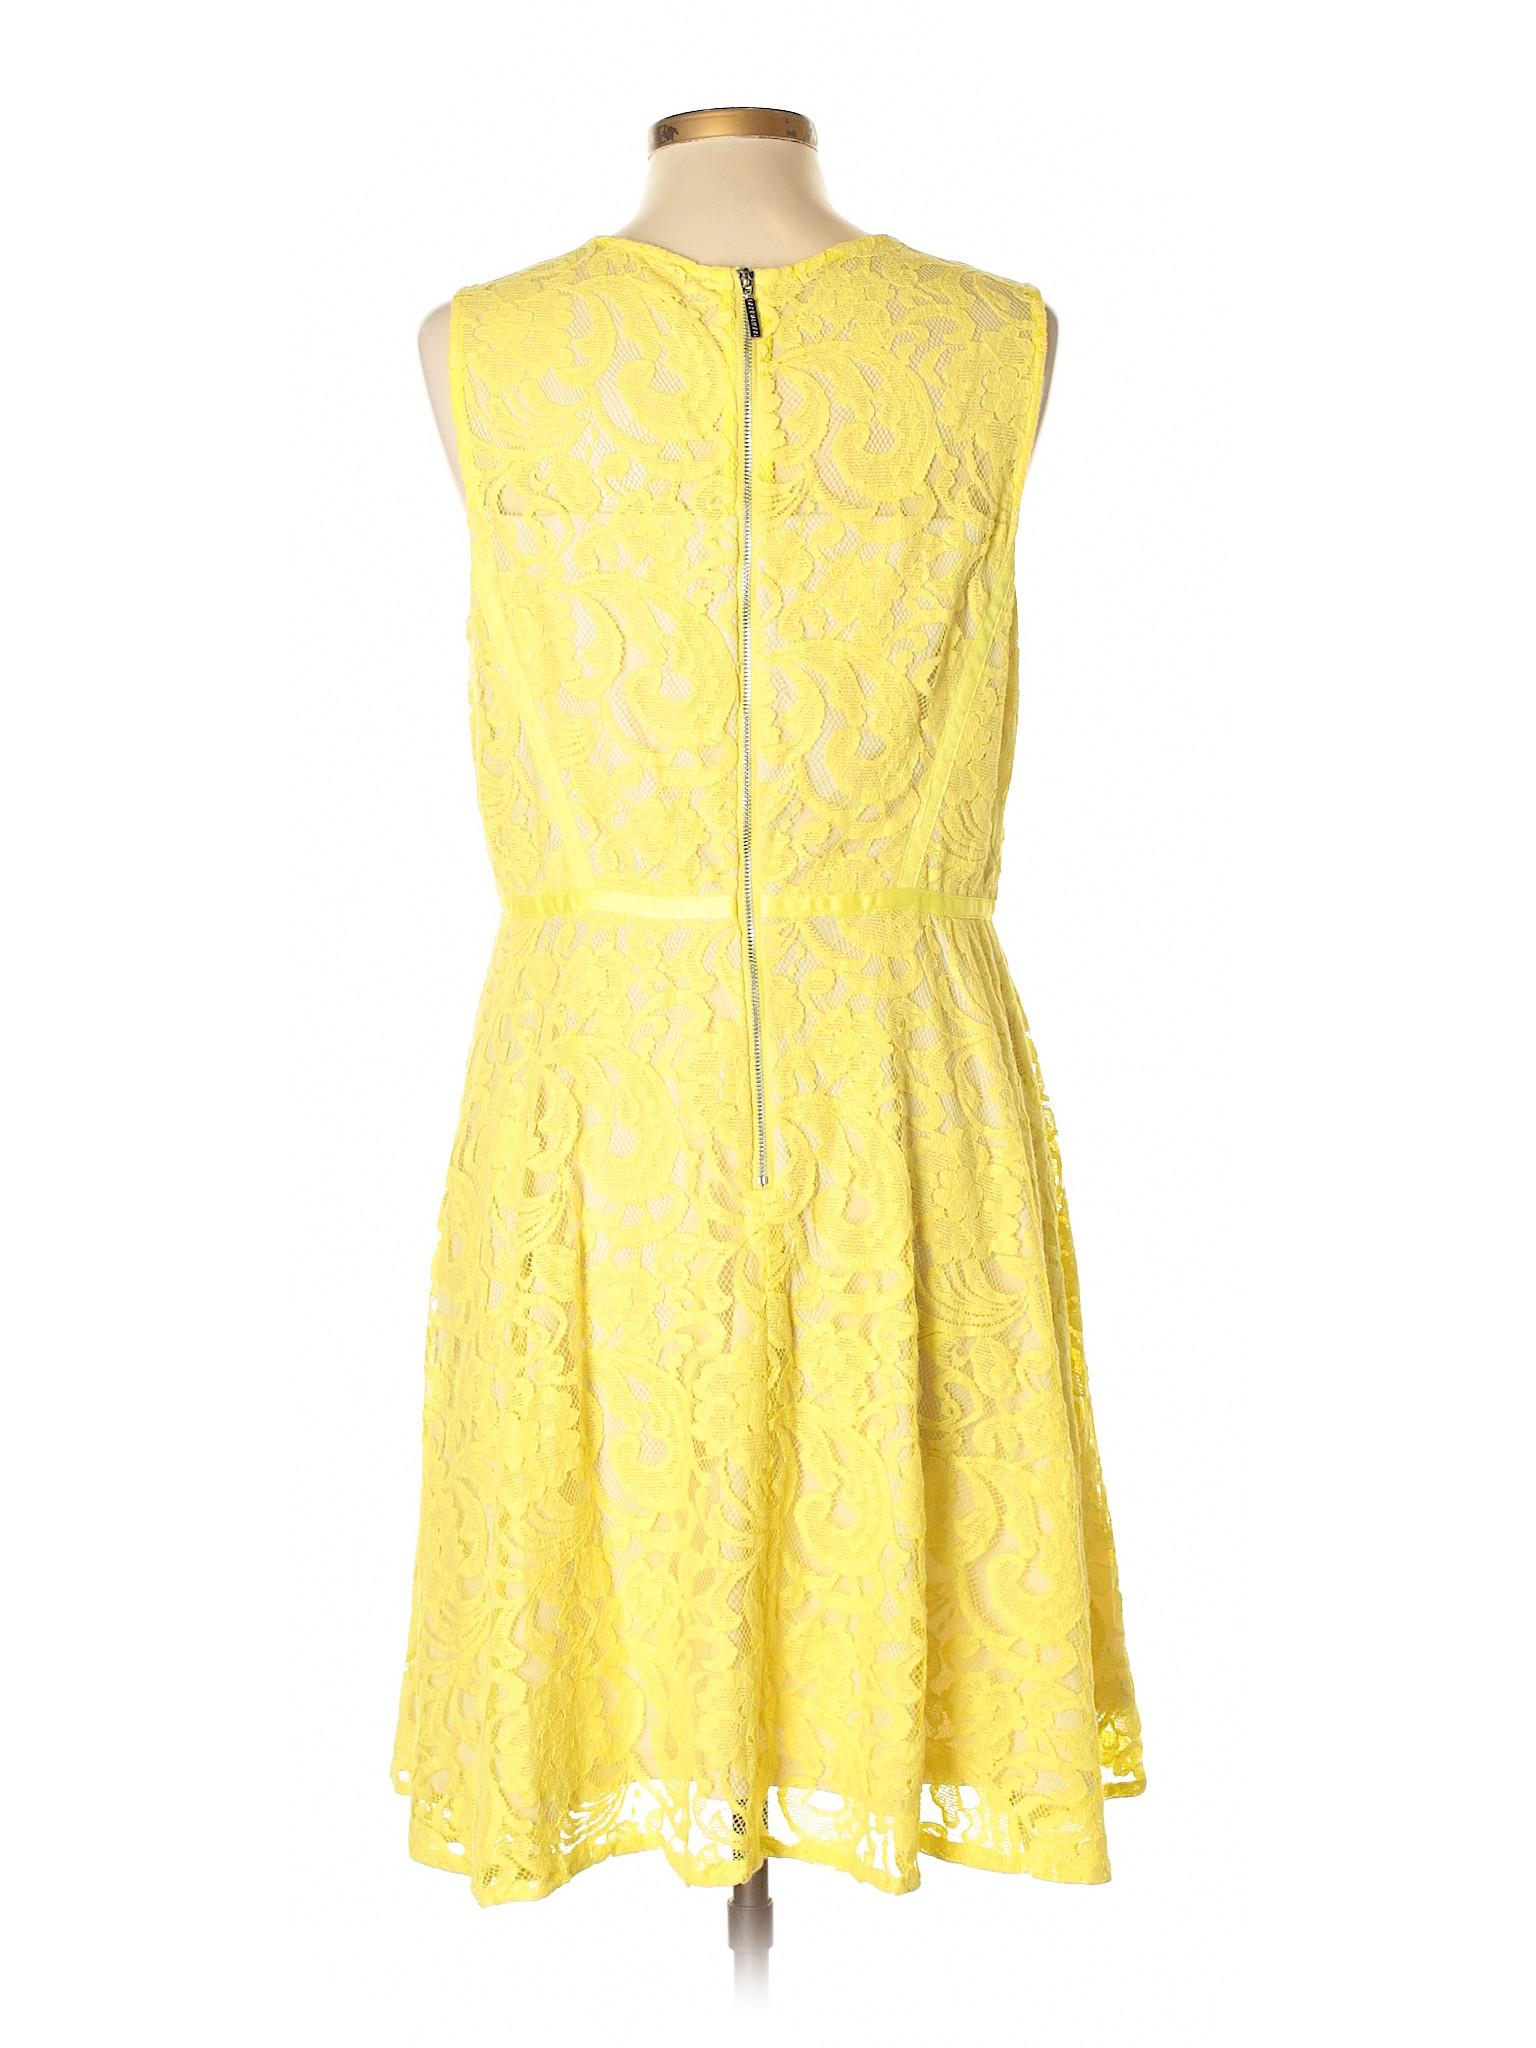 winter Casual Boutique Dress Donna Ricco xSYqYR1w